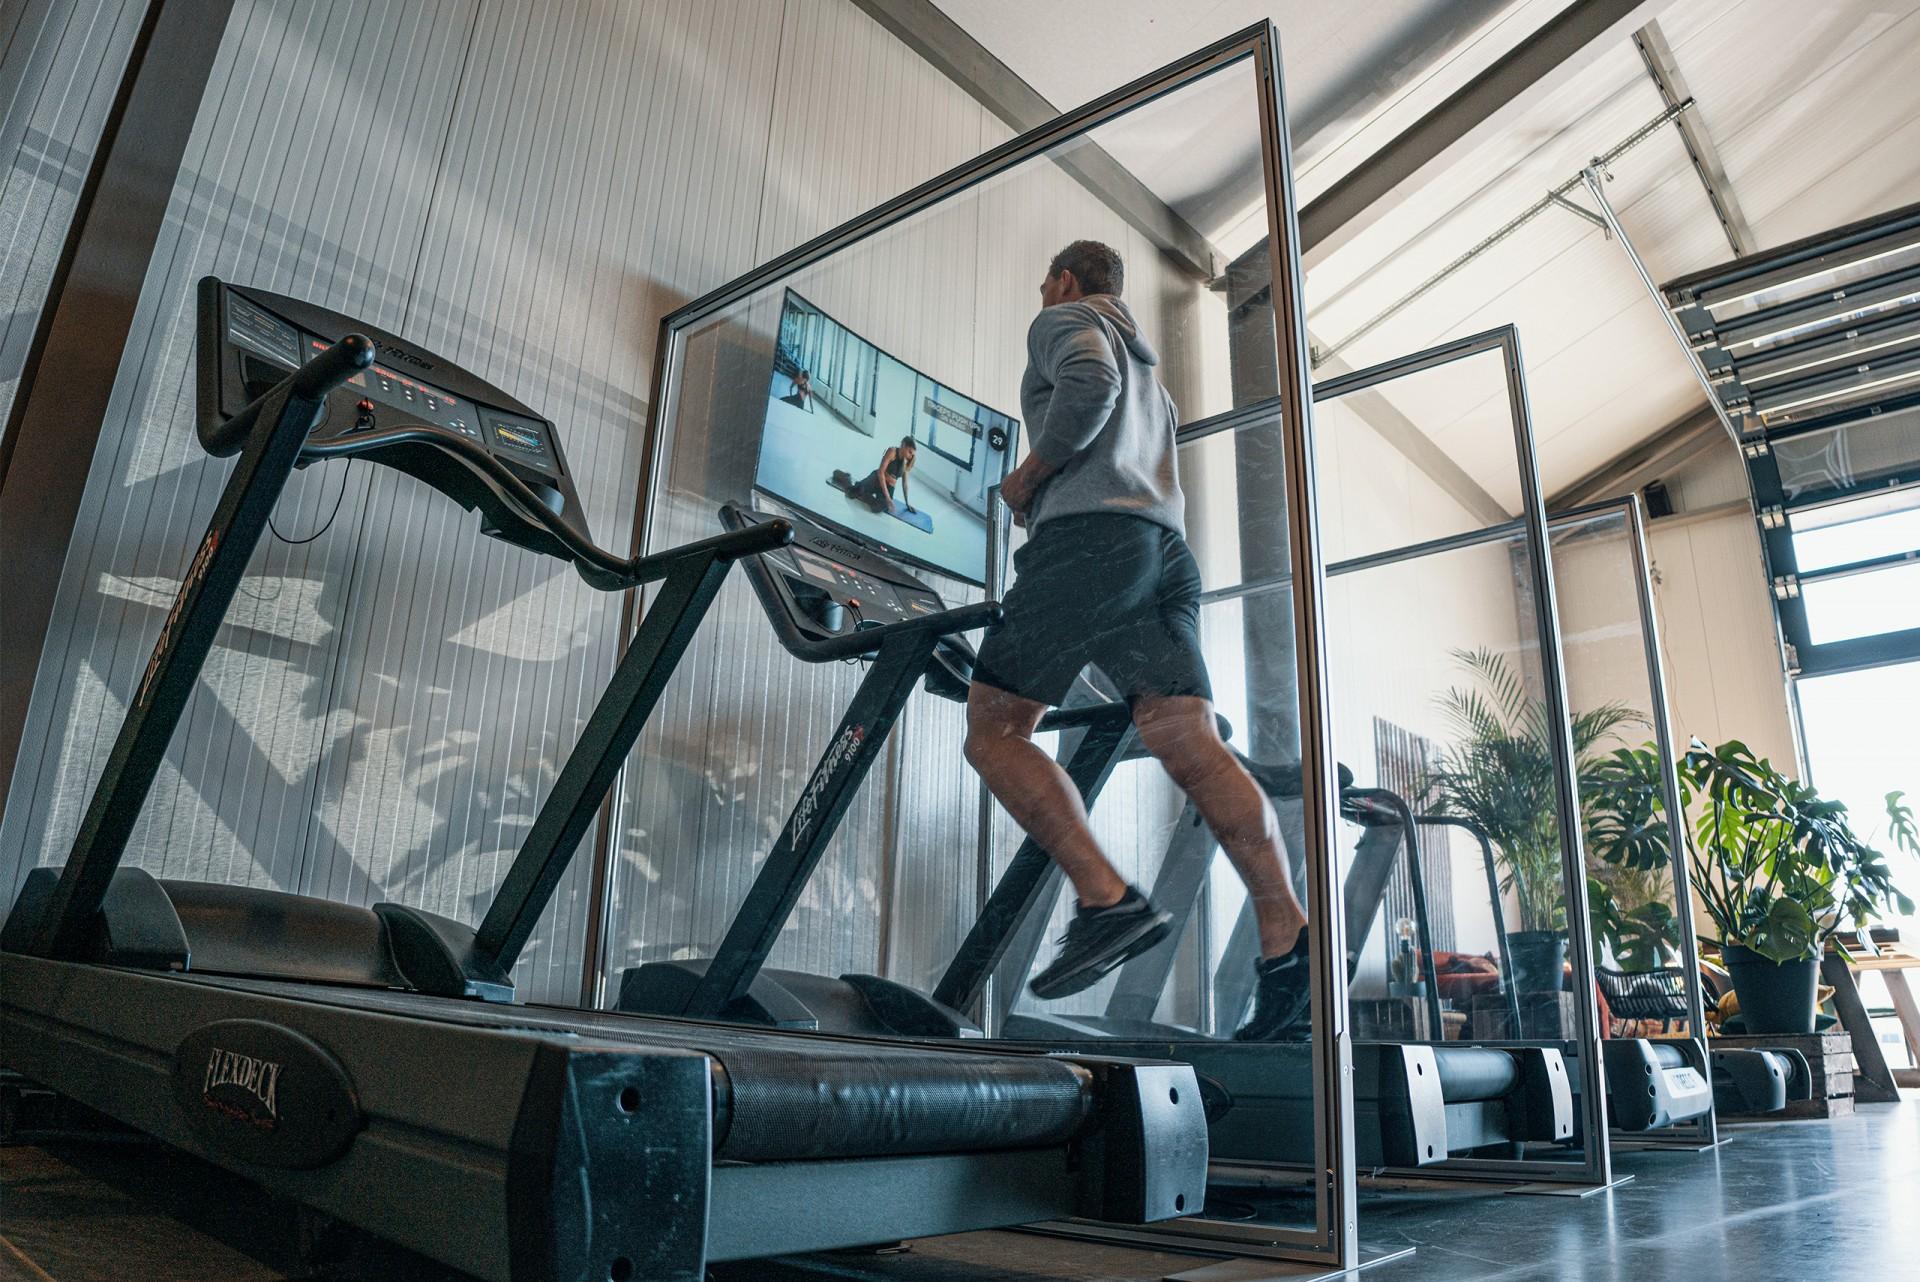 Spuckschutz Aluminiumrahmen Fitnessstudio